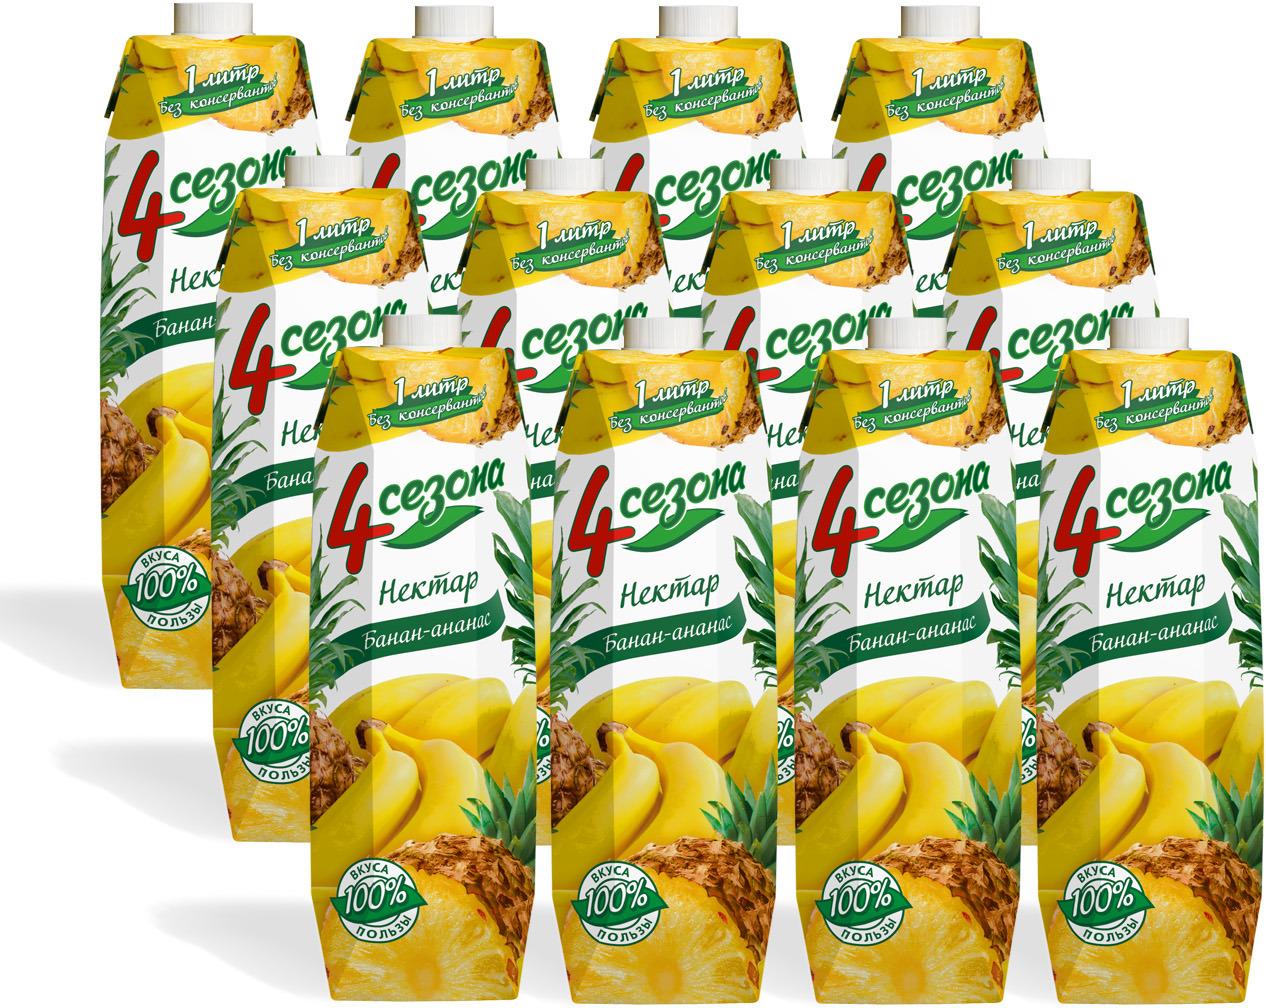 Нектар 4 сезона Банан - Ананас, 12 шт по 1 л